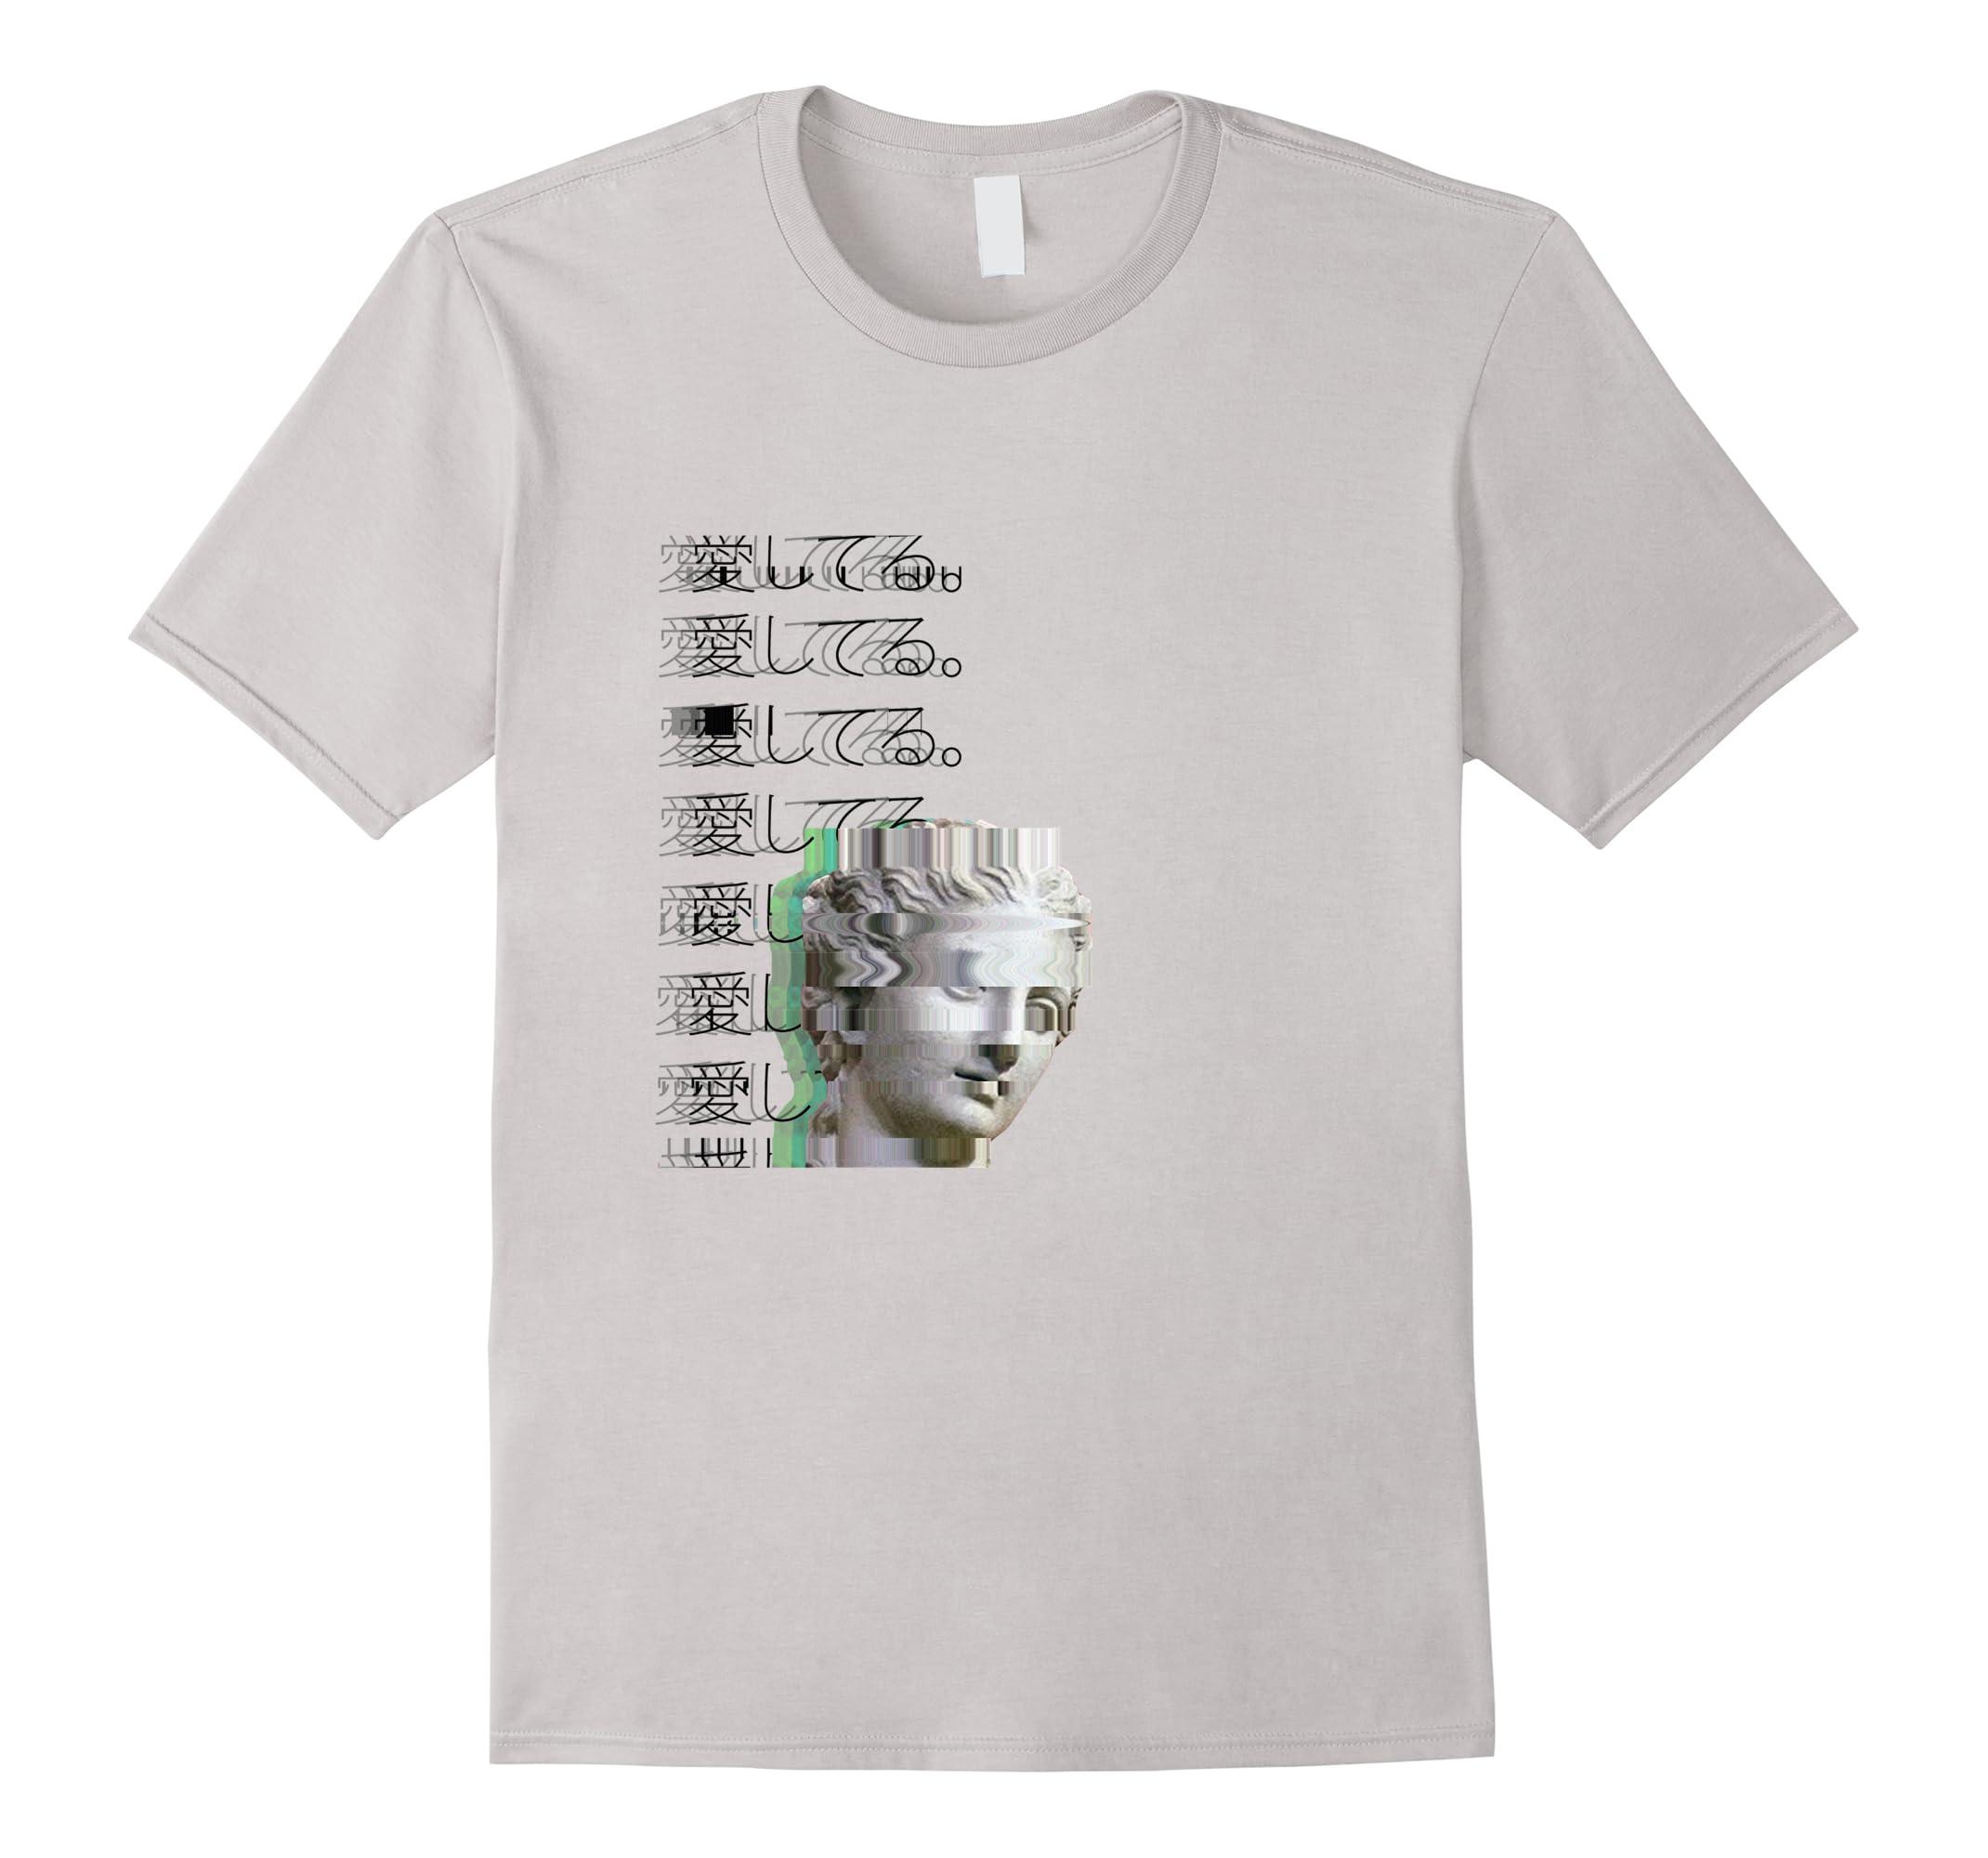 cf665887caa4f Amazon.com: Retro Hipster 90s Fashion T Shirt - Vaporwave and ...